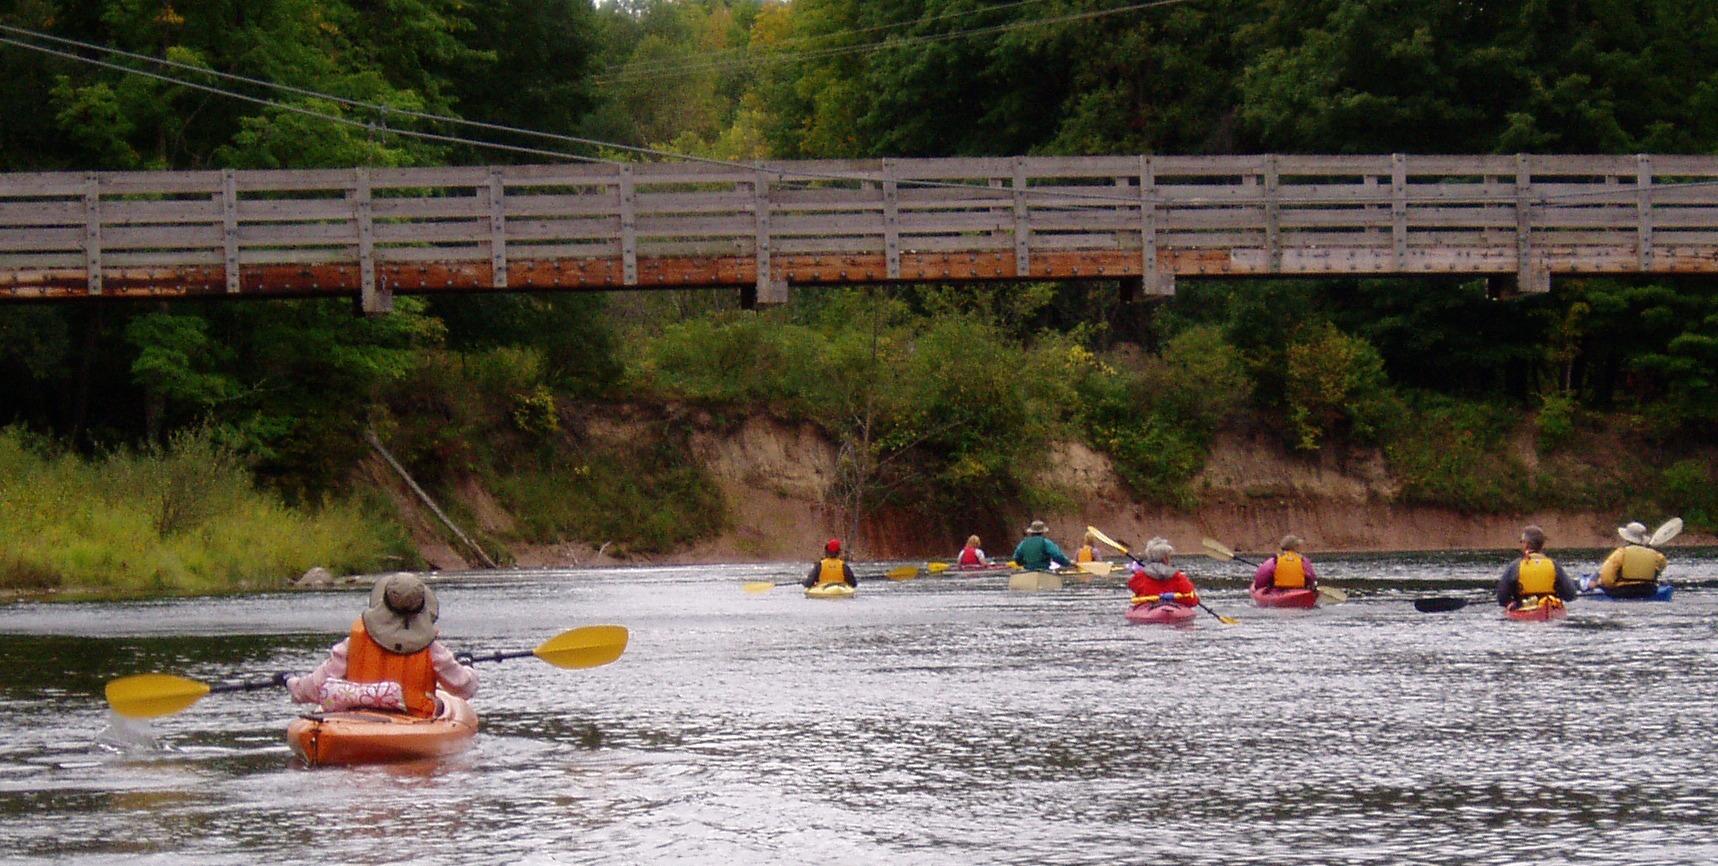 Kayakers paddiling below the suspension bridge on the big Manistee